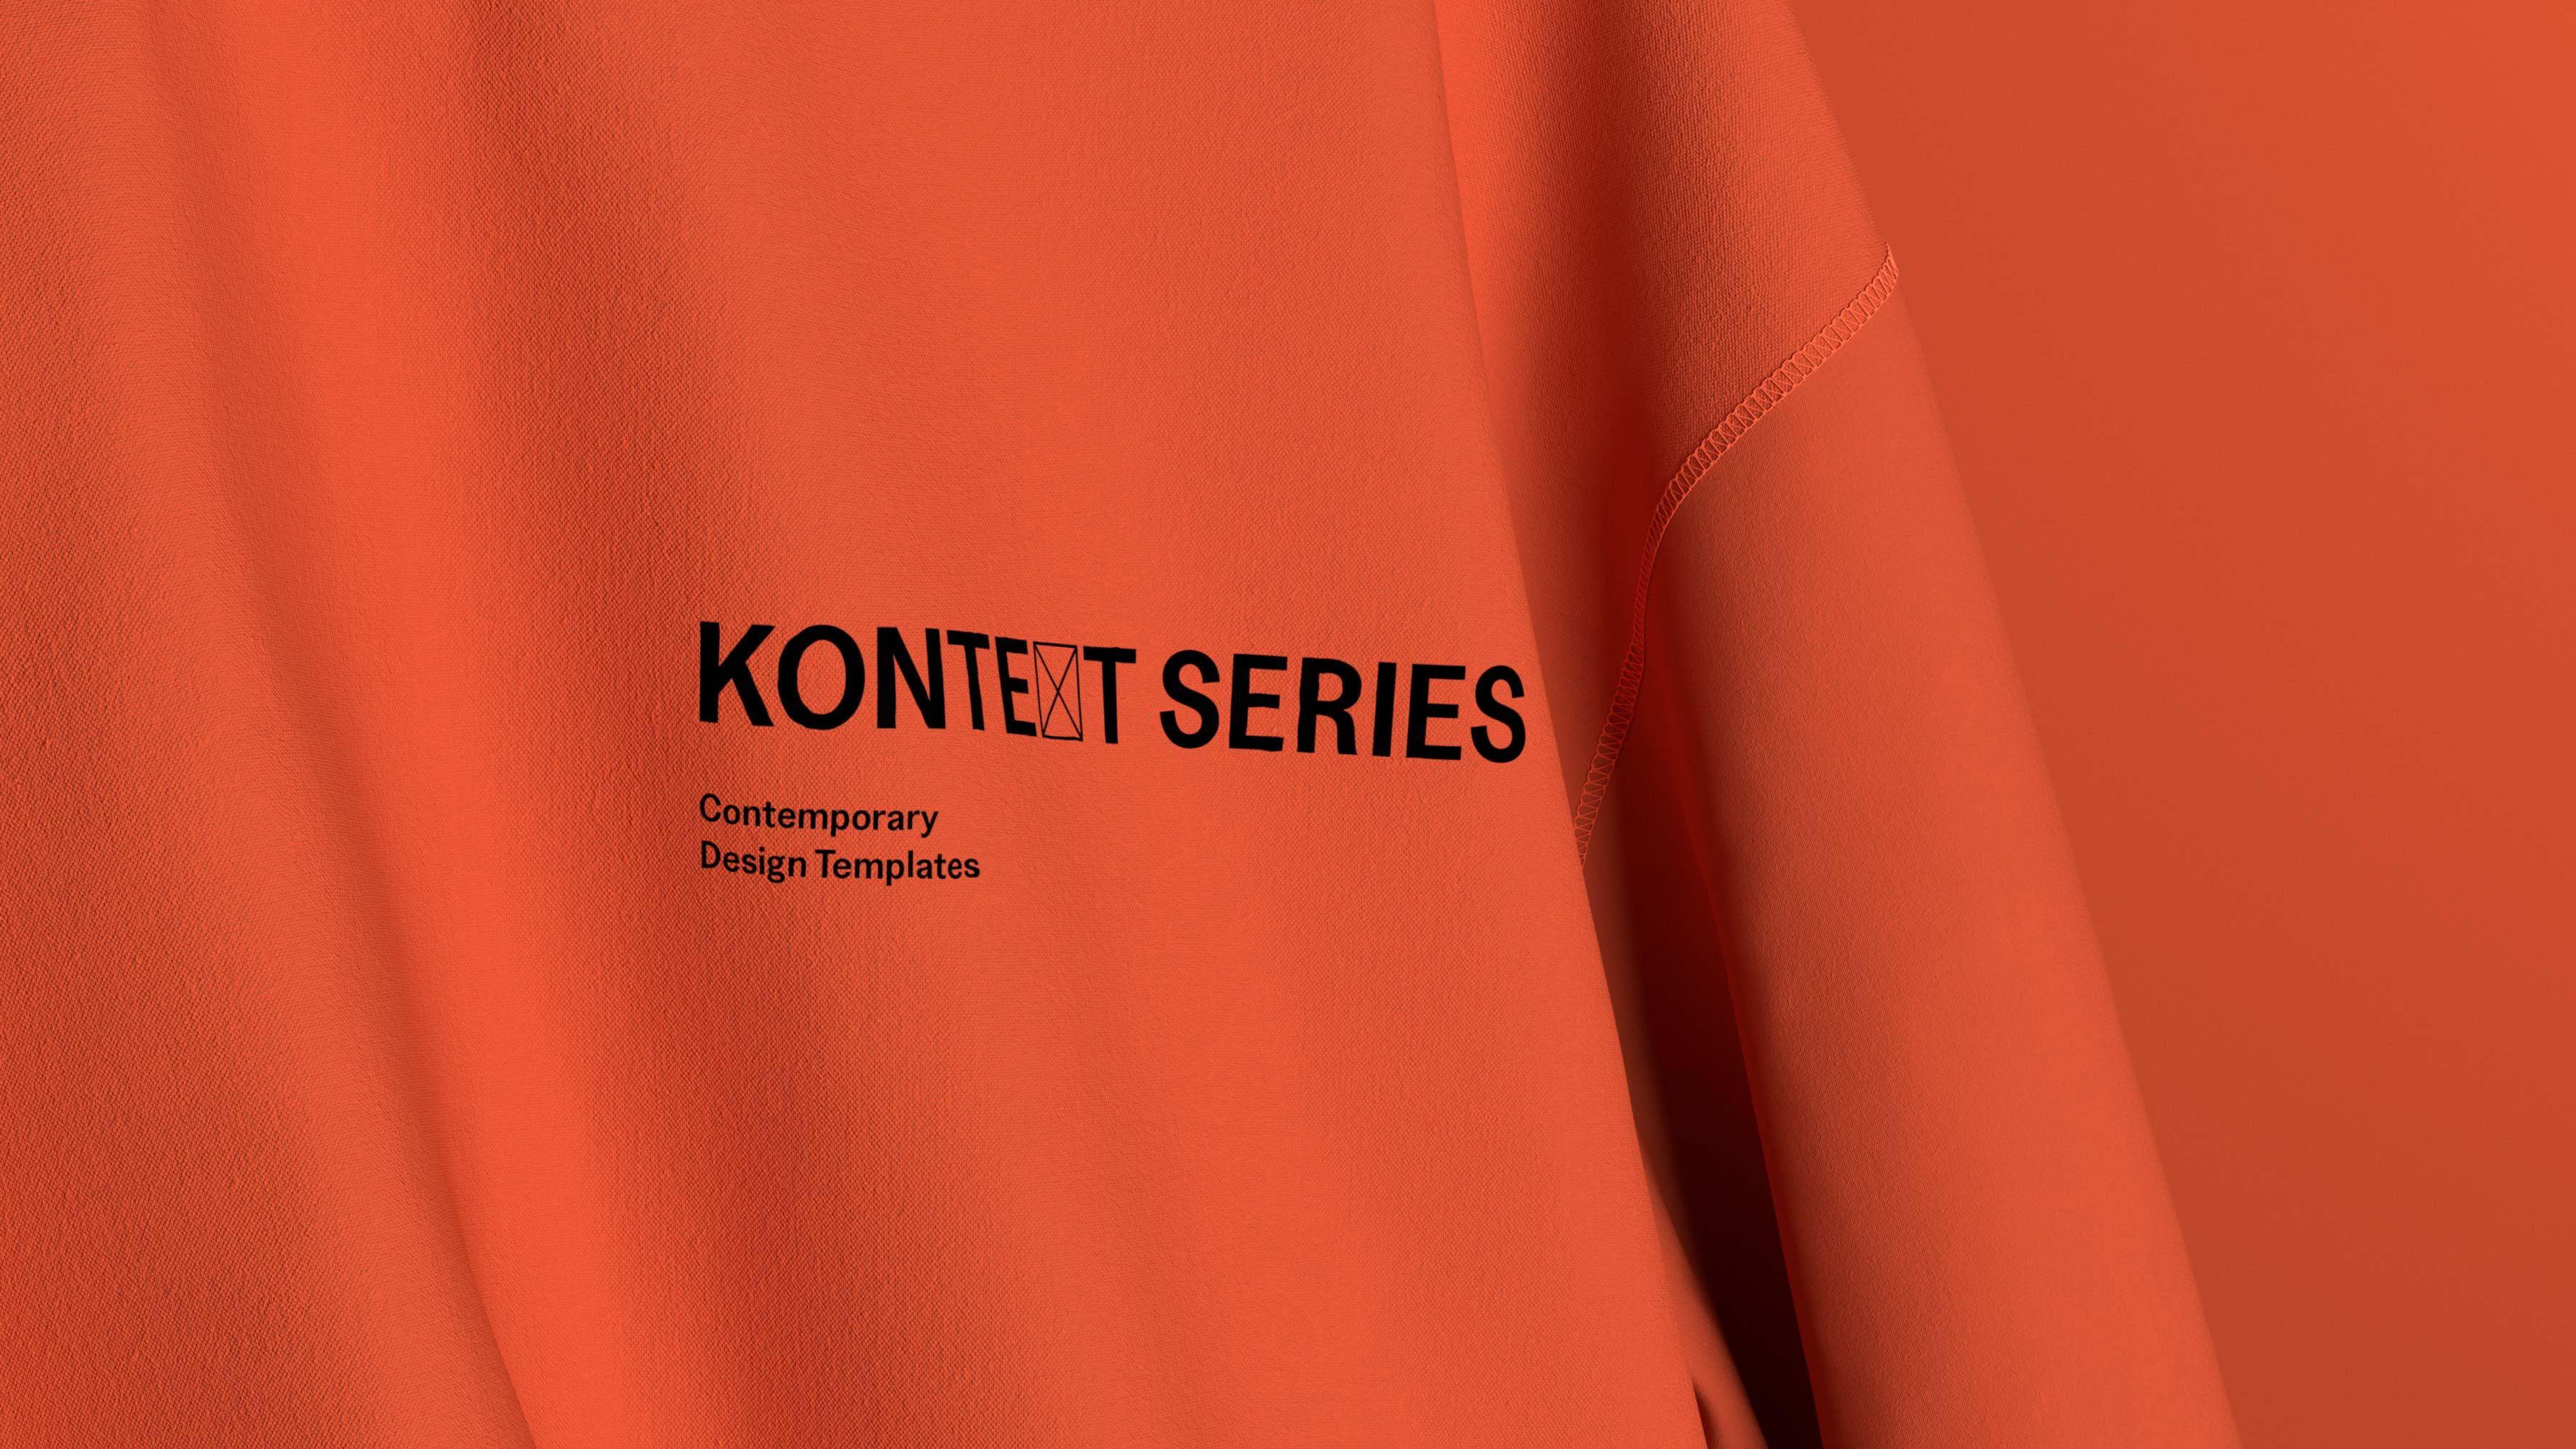 Kontext - Shirt Mockup